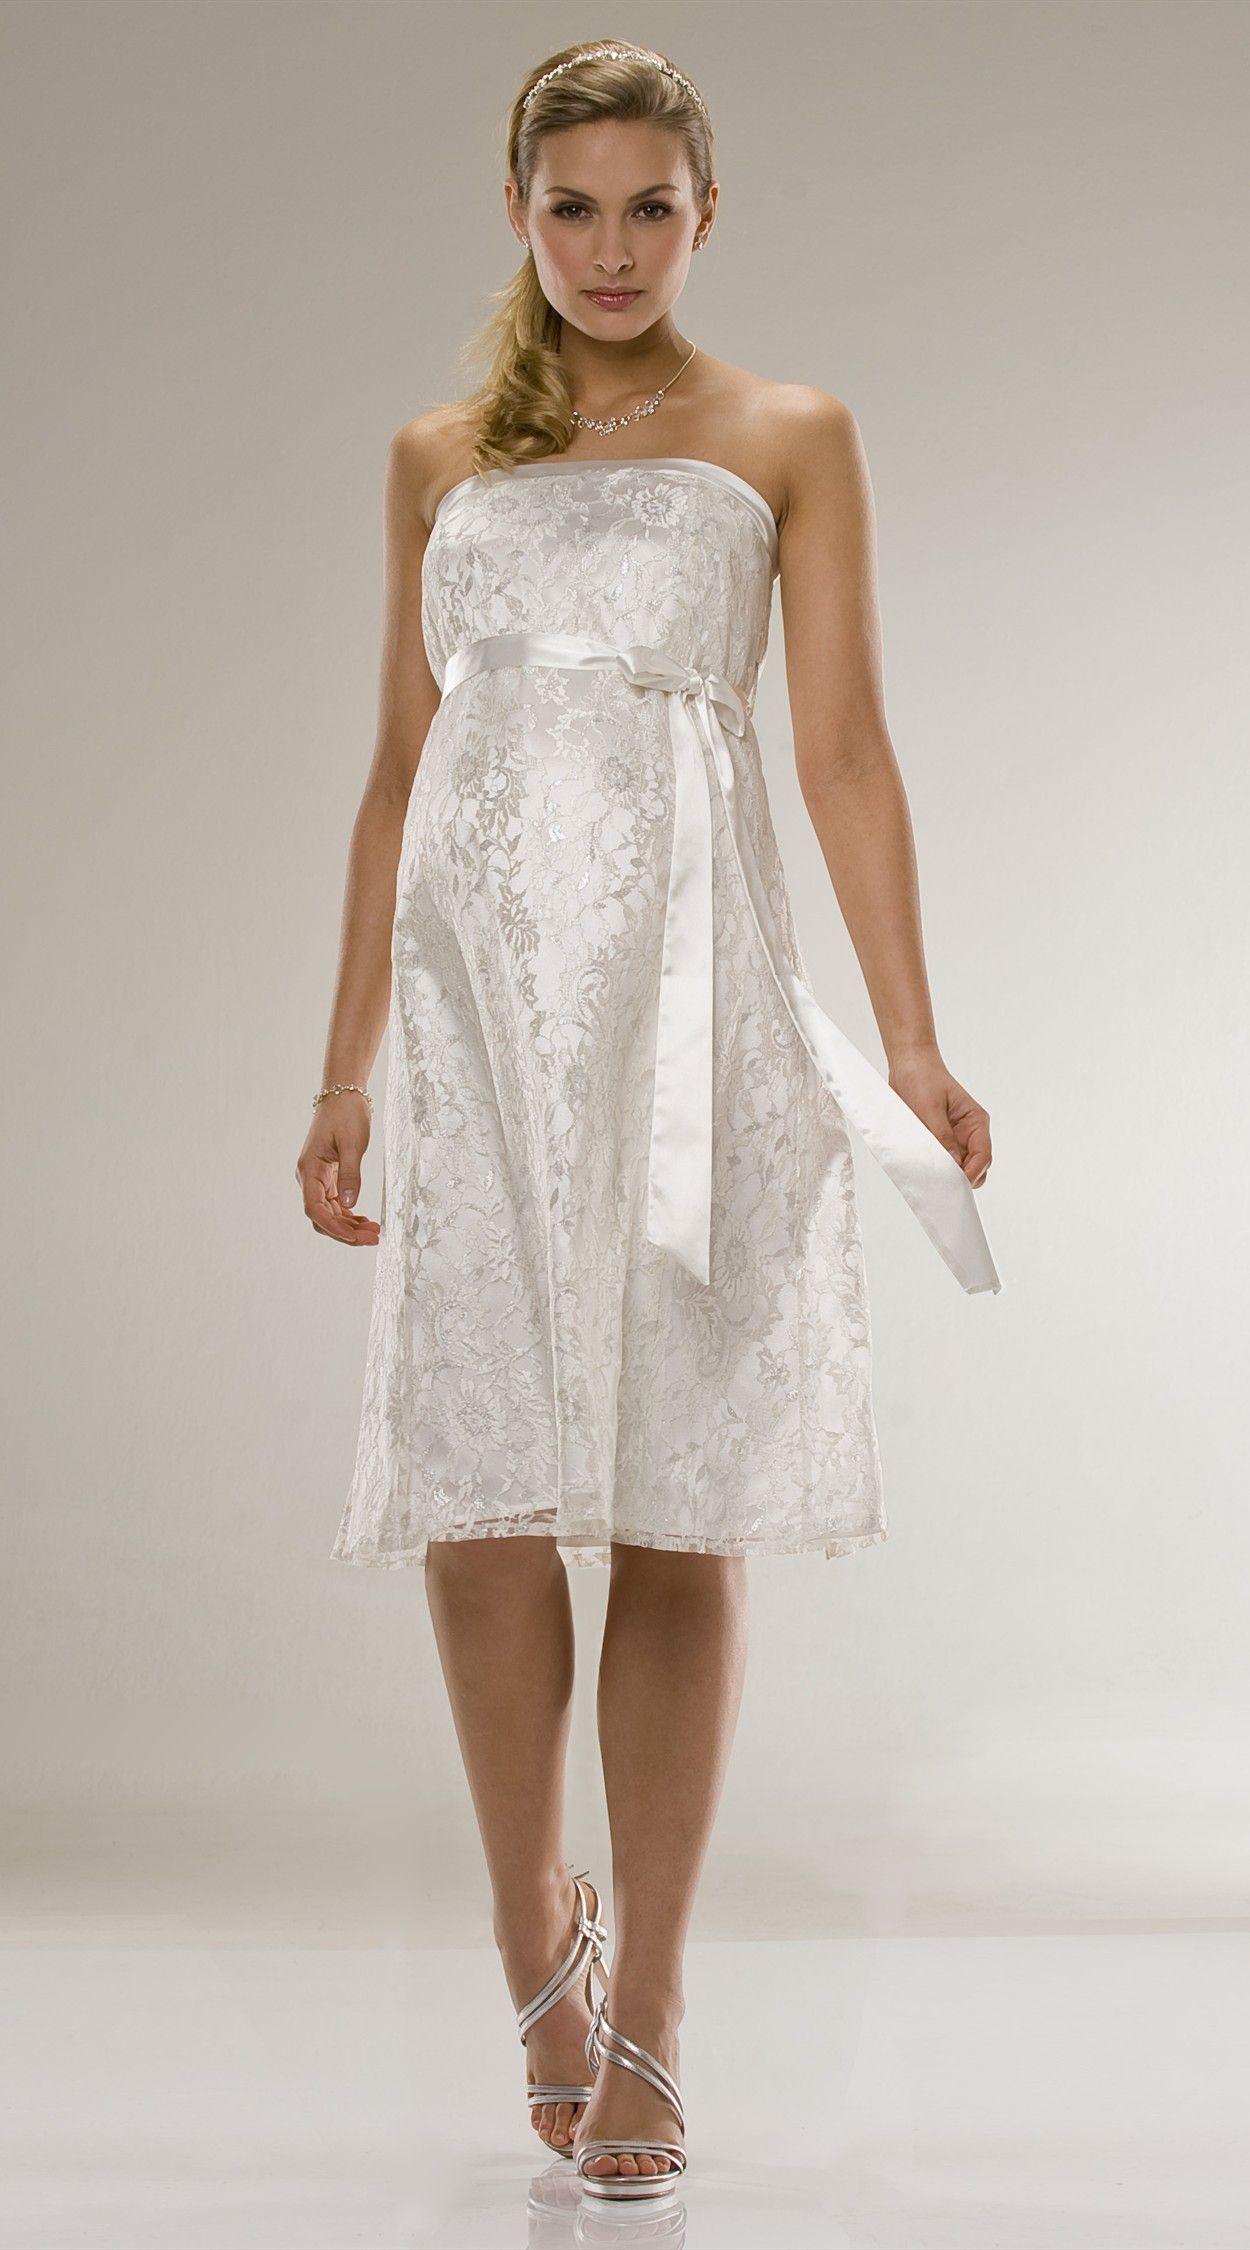 Kleid 'Lovely Princess' · Sweetbelly Umstandsmode Shop